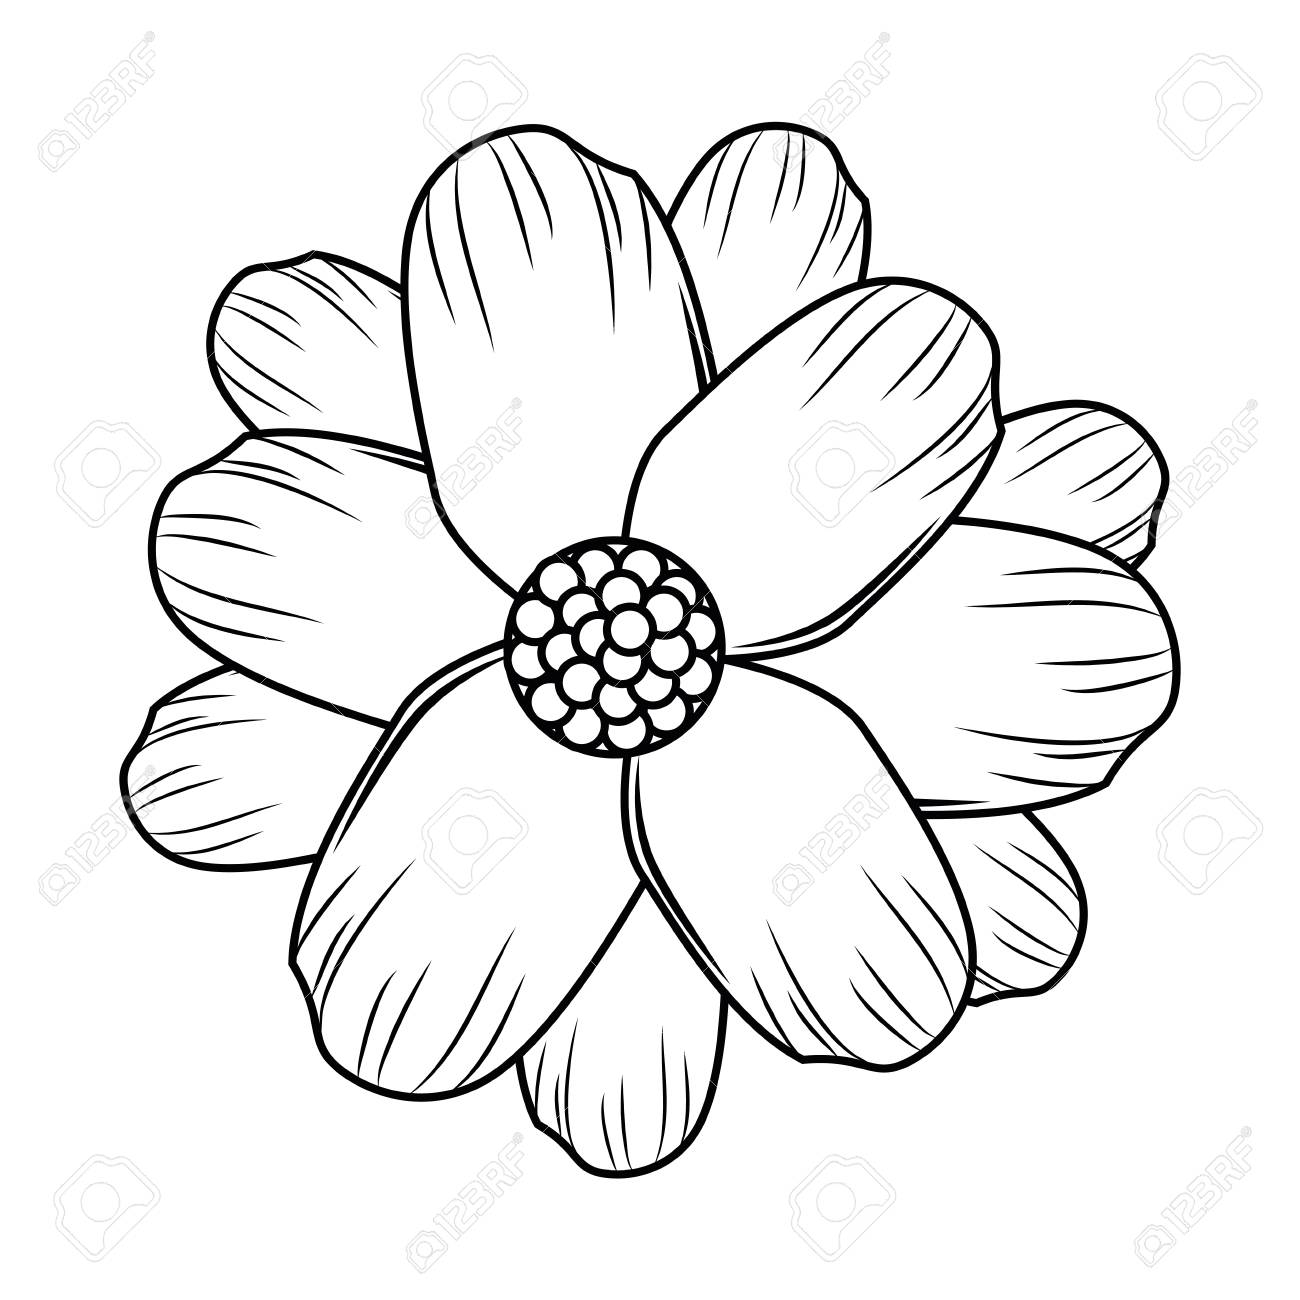 Flower Symbol Cartoon Black And White Vector Illustration Graphic